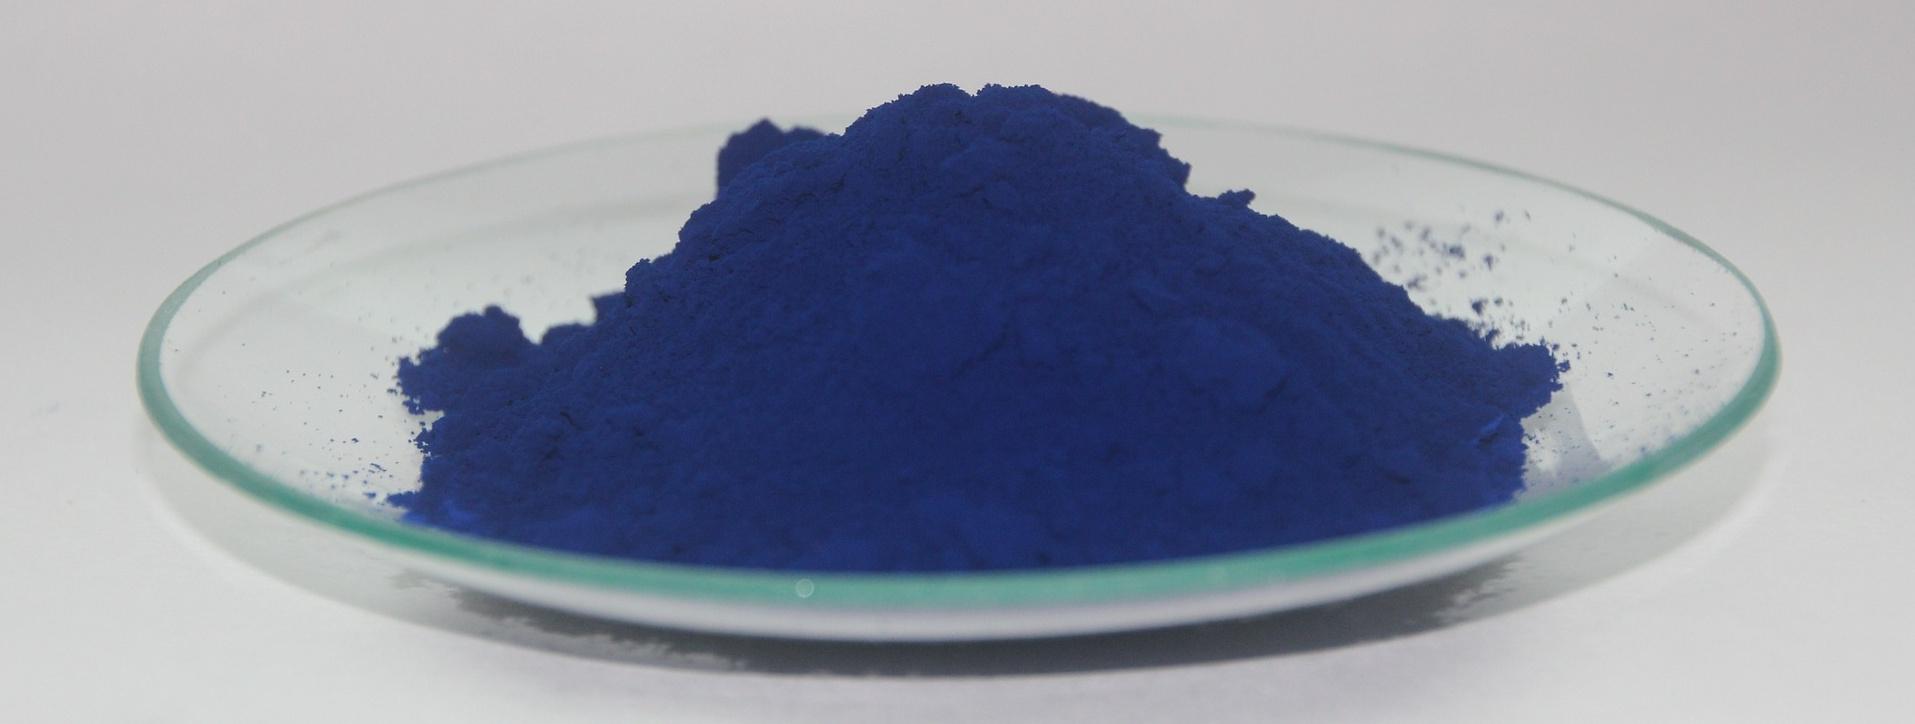 indigo, dye, pigment, blue dye, food coloring, artificial coloring